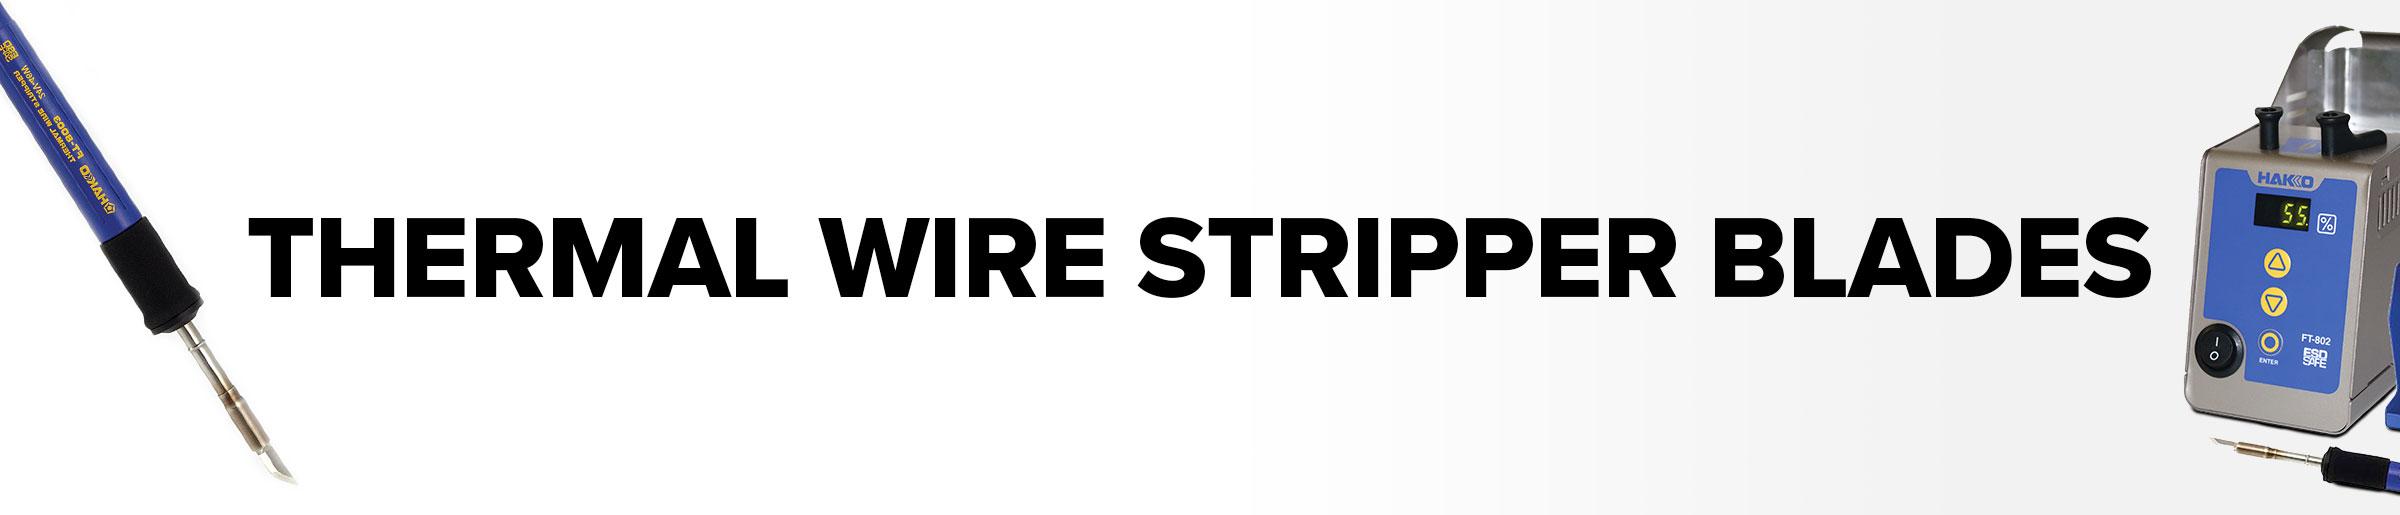 Thermal Wire Stripper Blades